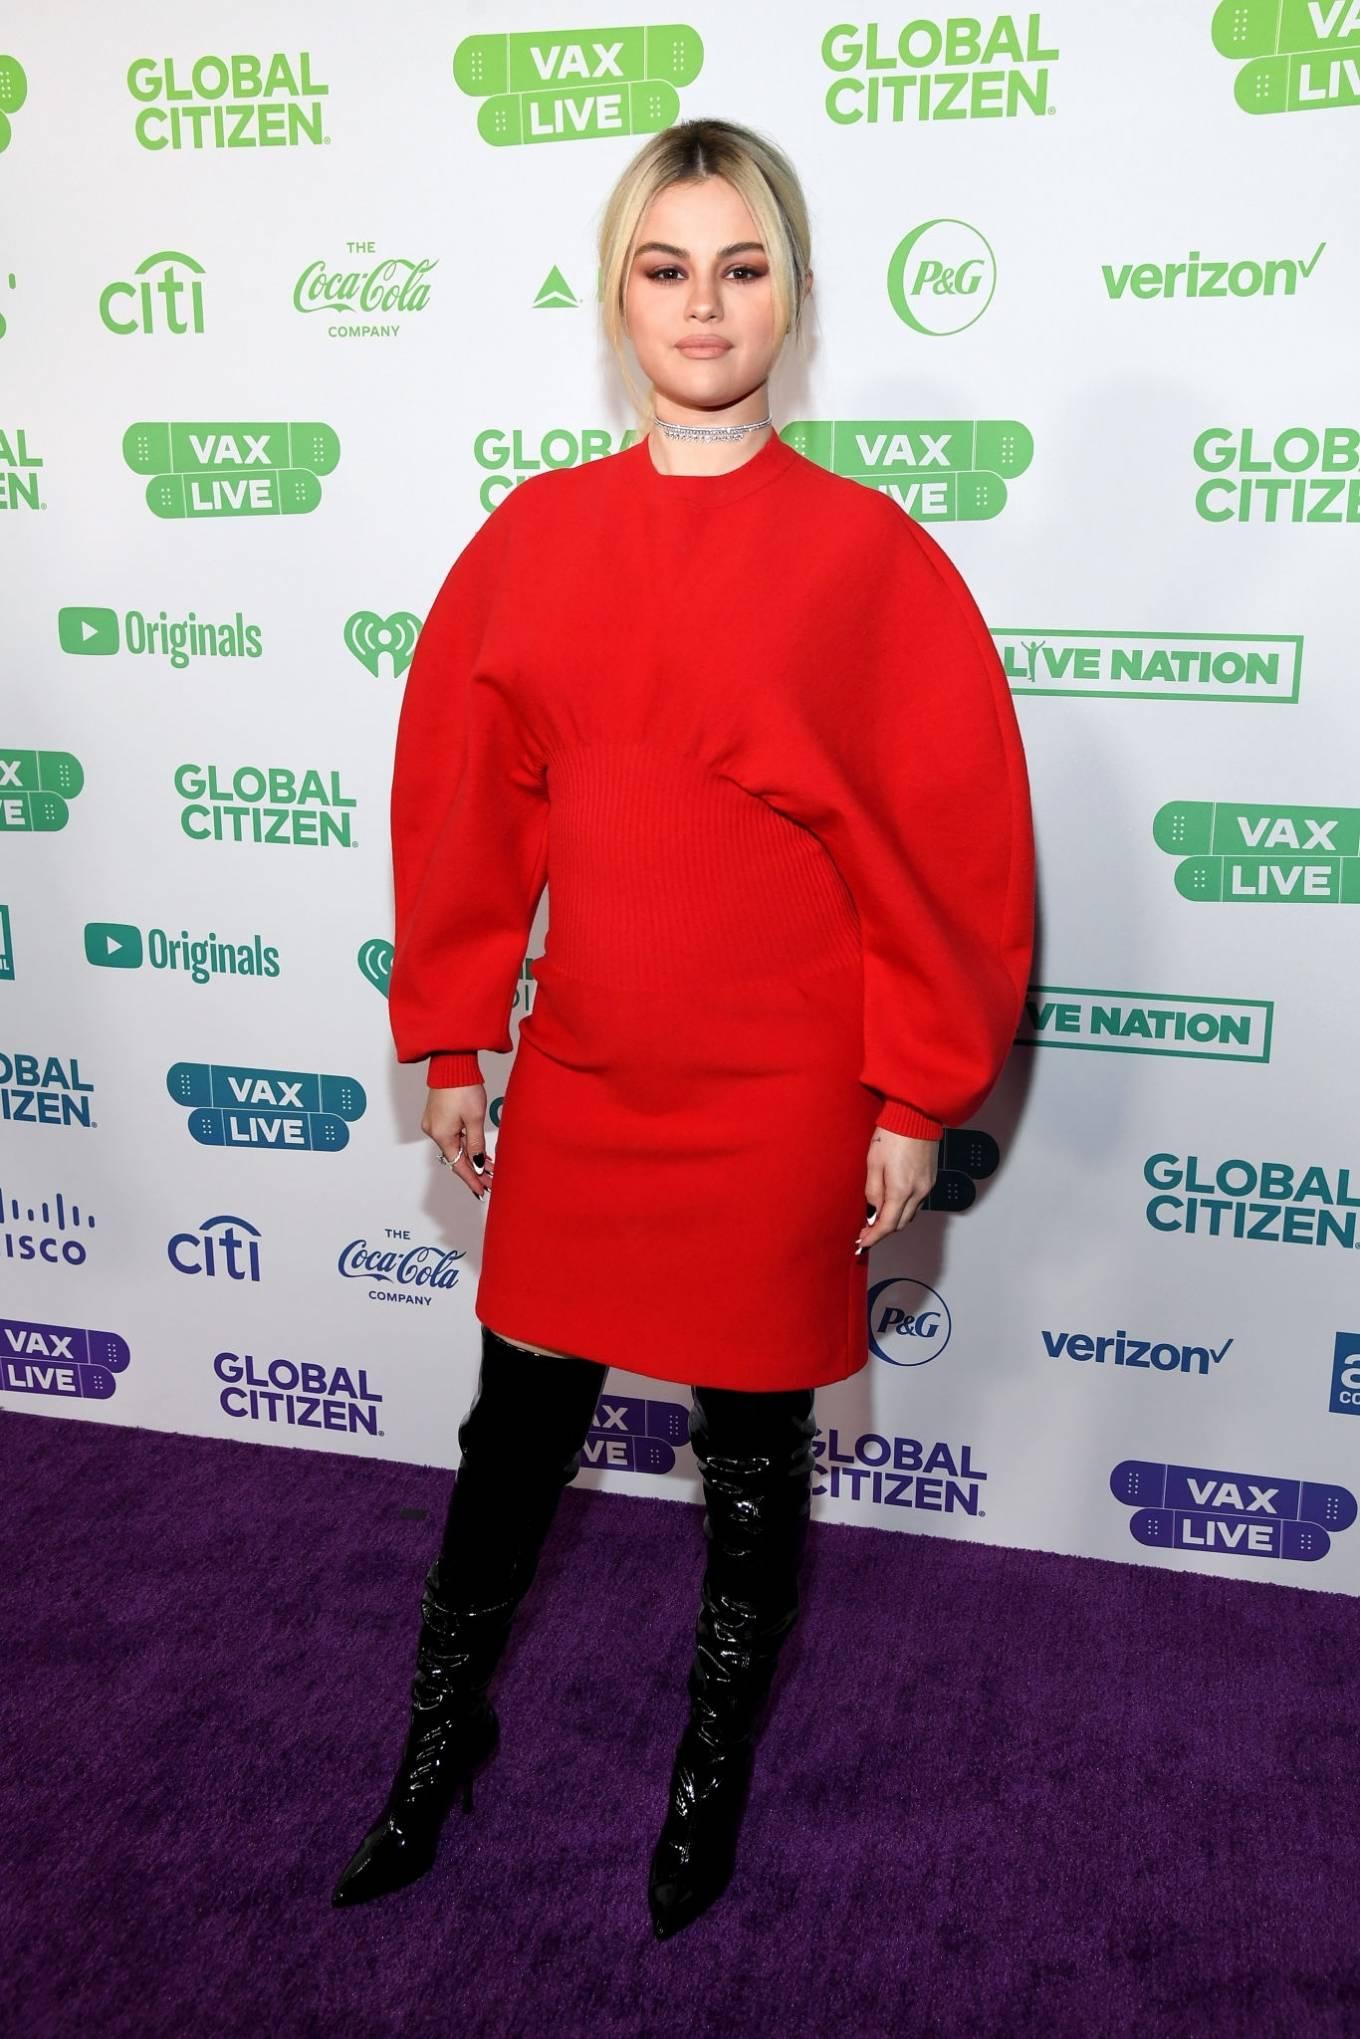 Selena Gomez, black boots, leather, red Bottega Veneta dress, ruched, pointed, thigh high, high heel, tapered toe. Selena Gomez donning ruched black leather thigh high boots with high heel